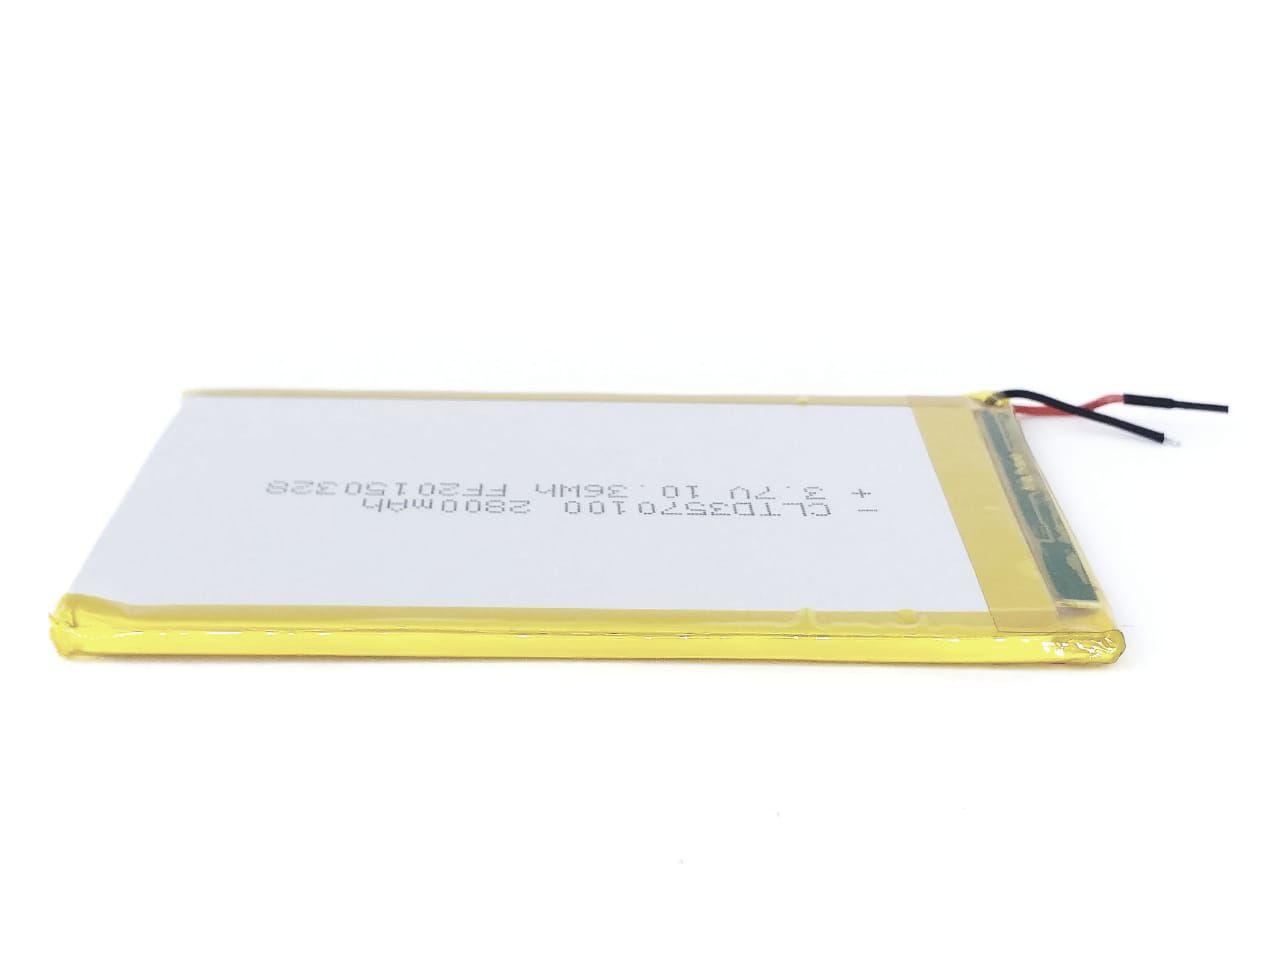 Bateria para Tablet Semp Toshiba TA0709GP ion-litio 2800mah 3.7V 36 Wh